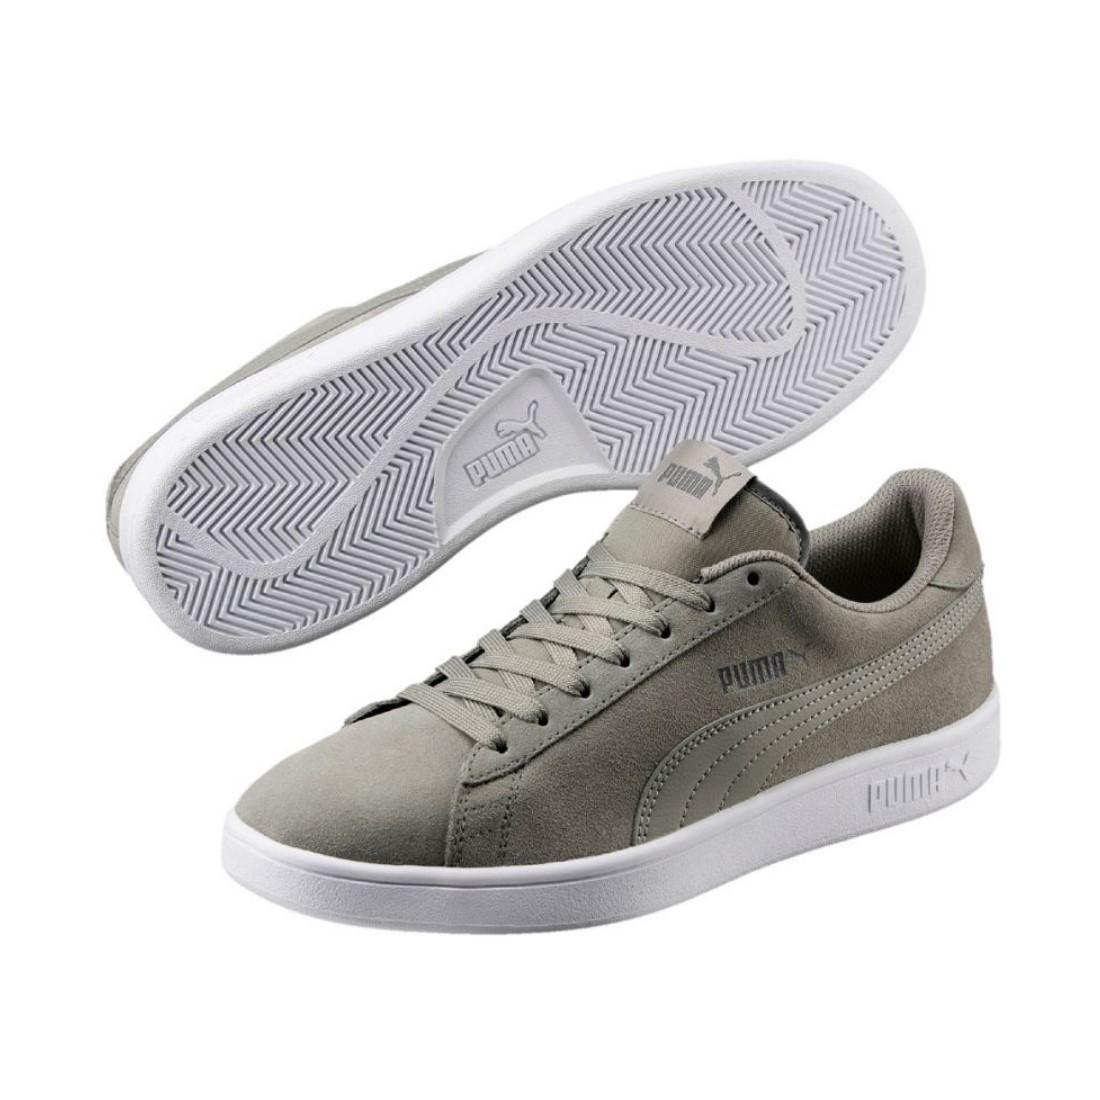 Puma Smash v2 Jersey Herren Sneaker Schuhe